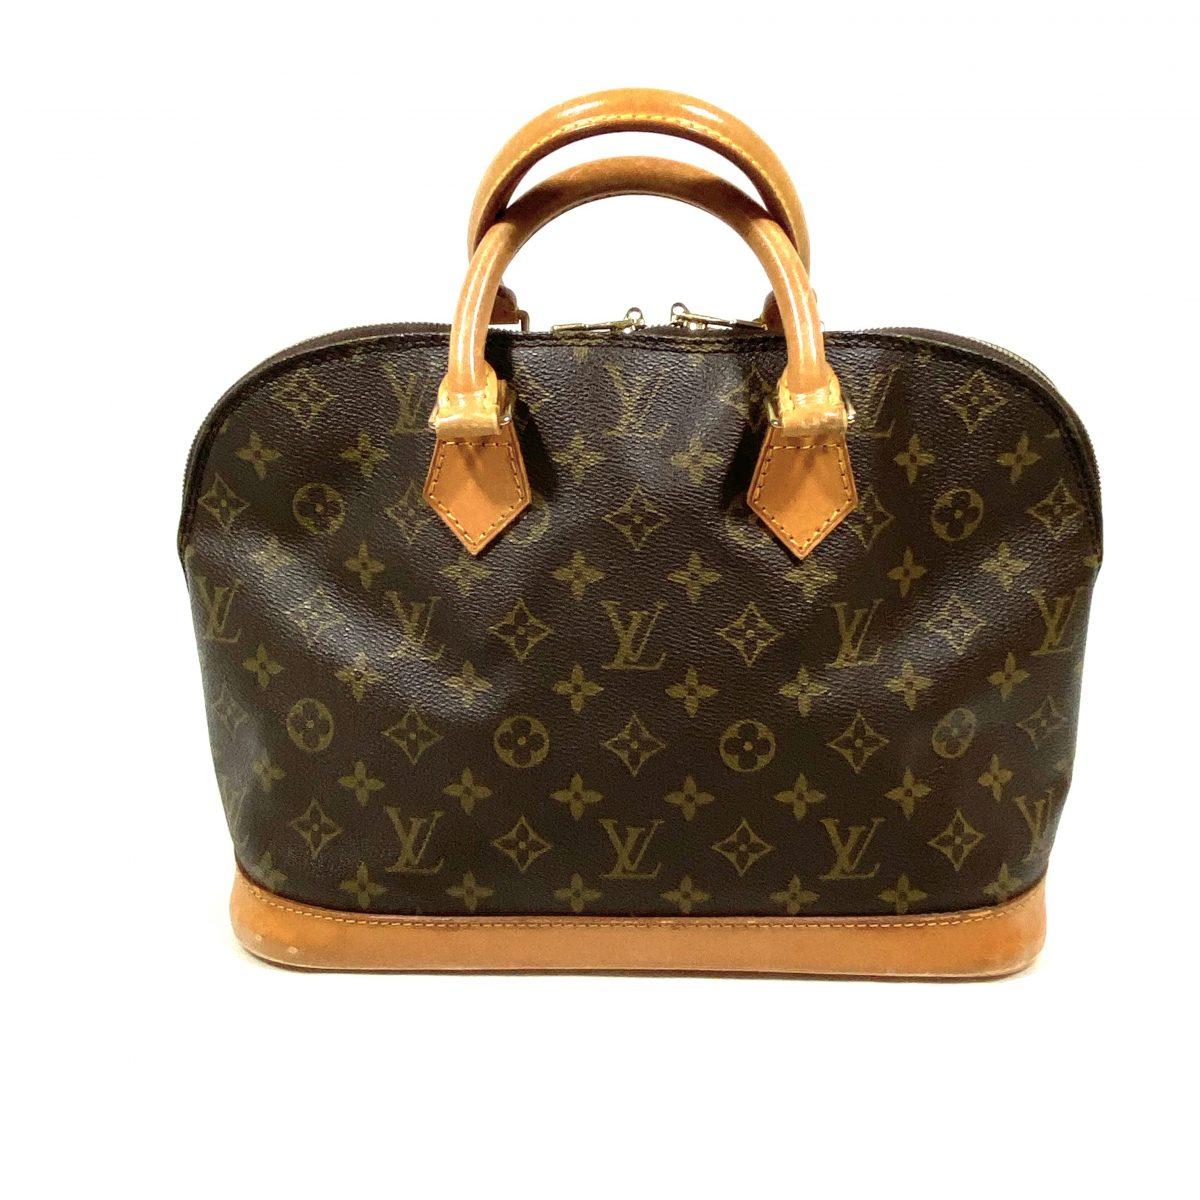 Louis Vuitton designer bags